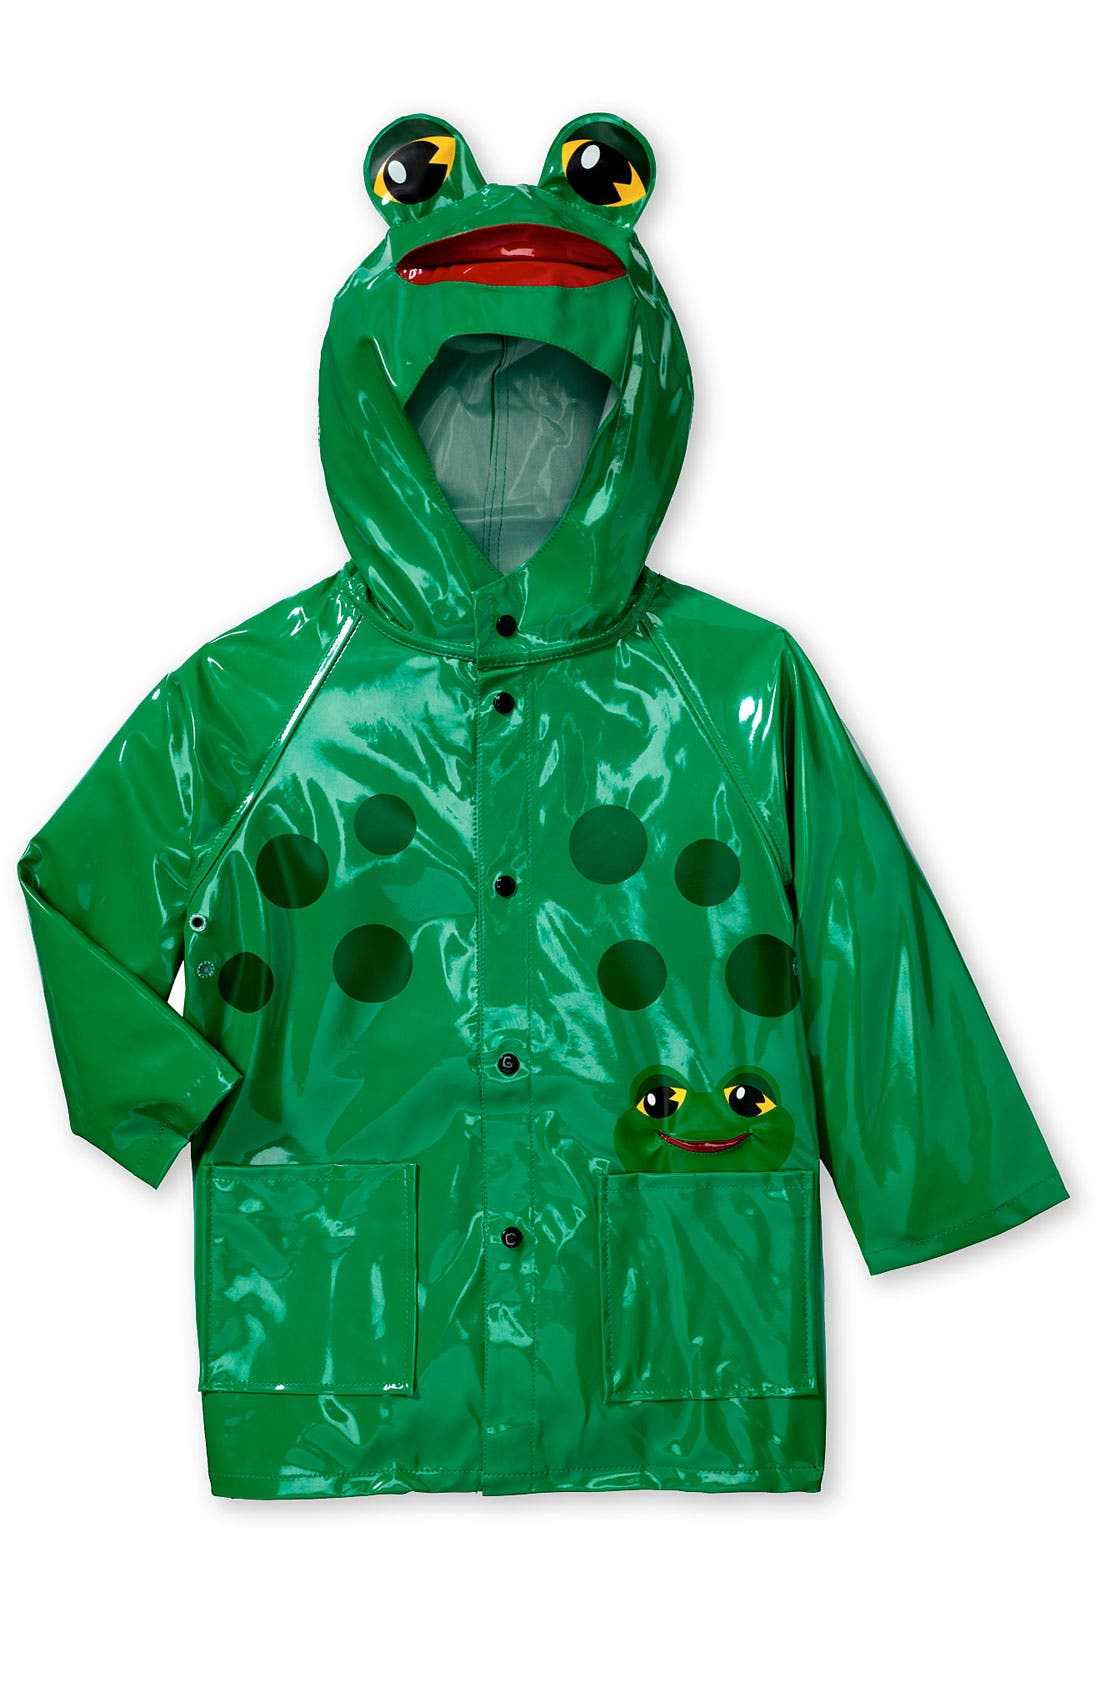 Alternate Image 1 Selected - Western Chief 'Frog' Raincoat (Toddler & Little Kid)